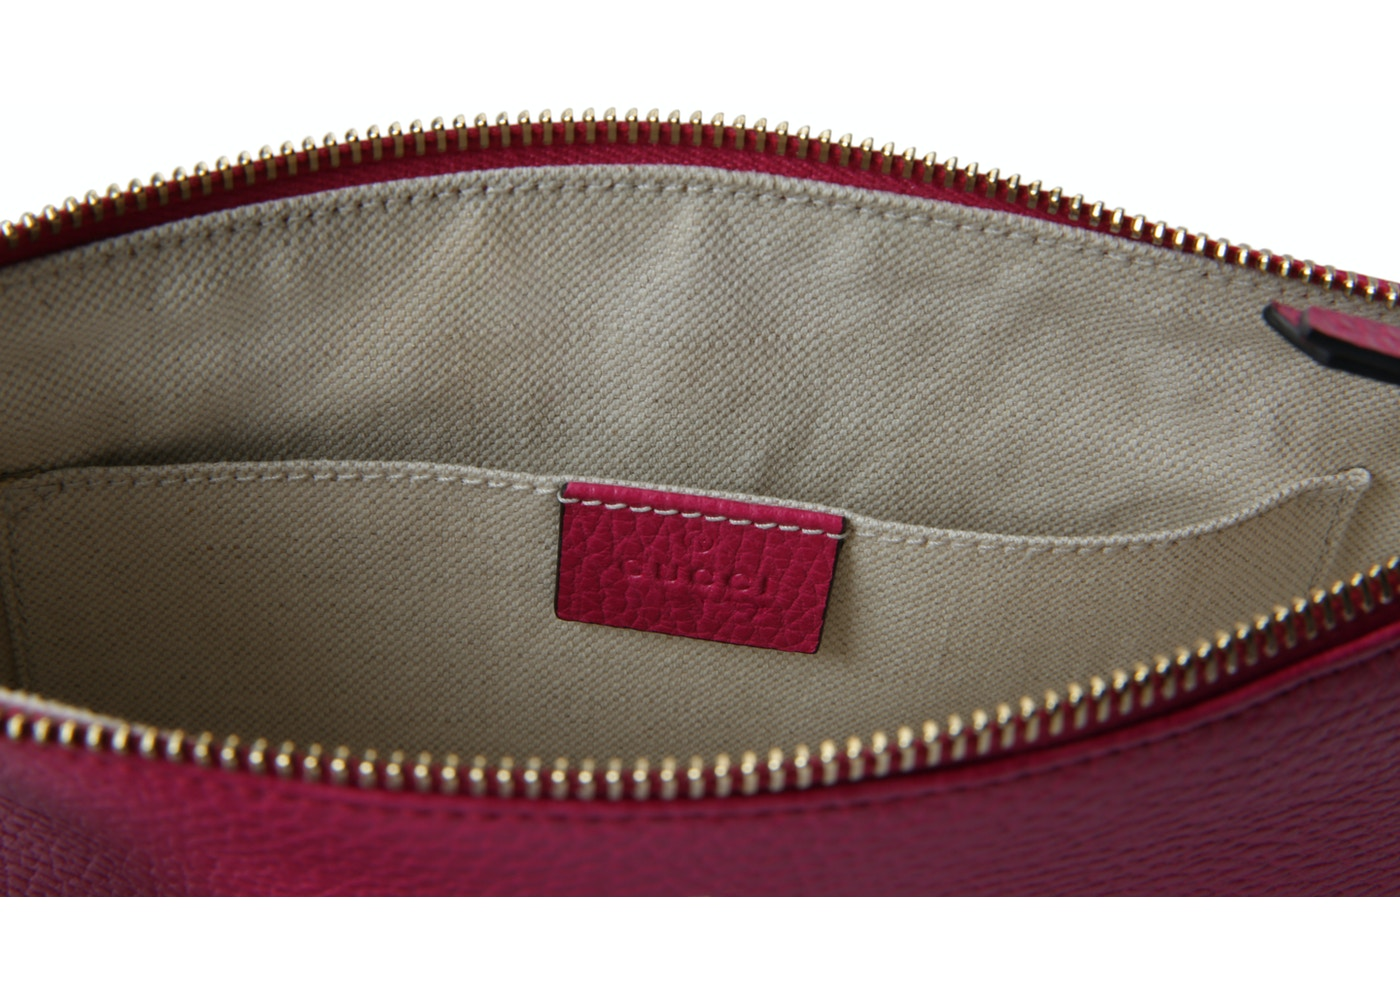 d0c711970329 Buy & Sell Gucci Handbags - Volatility